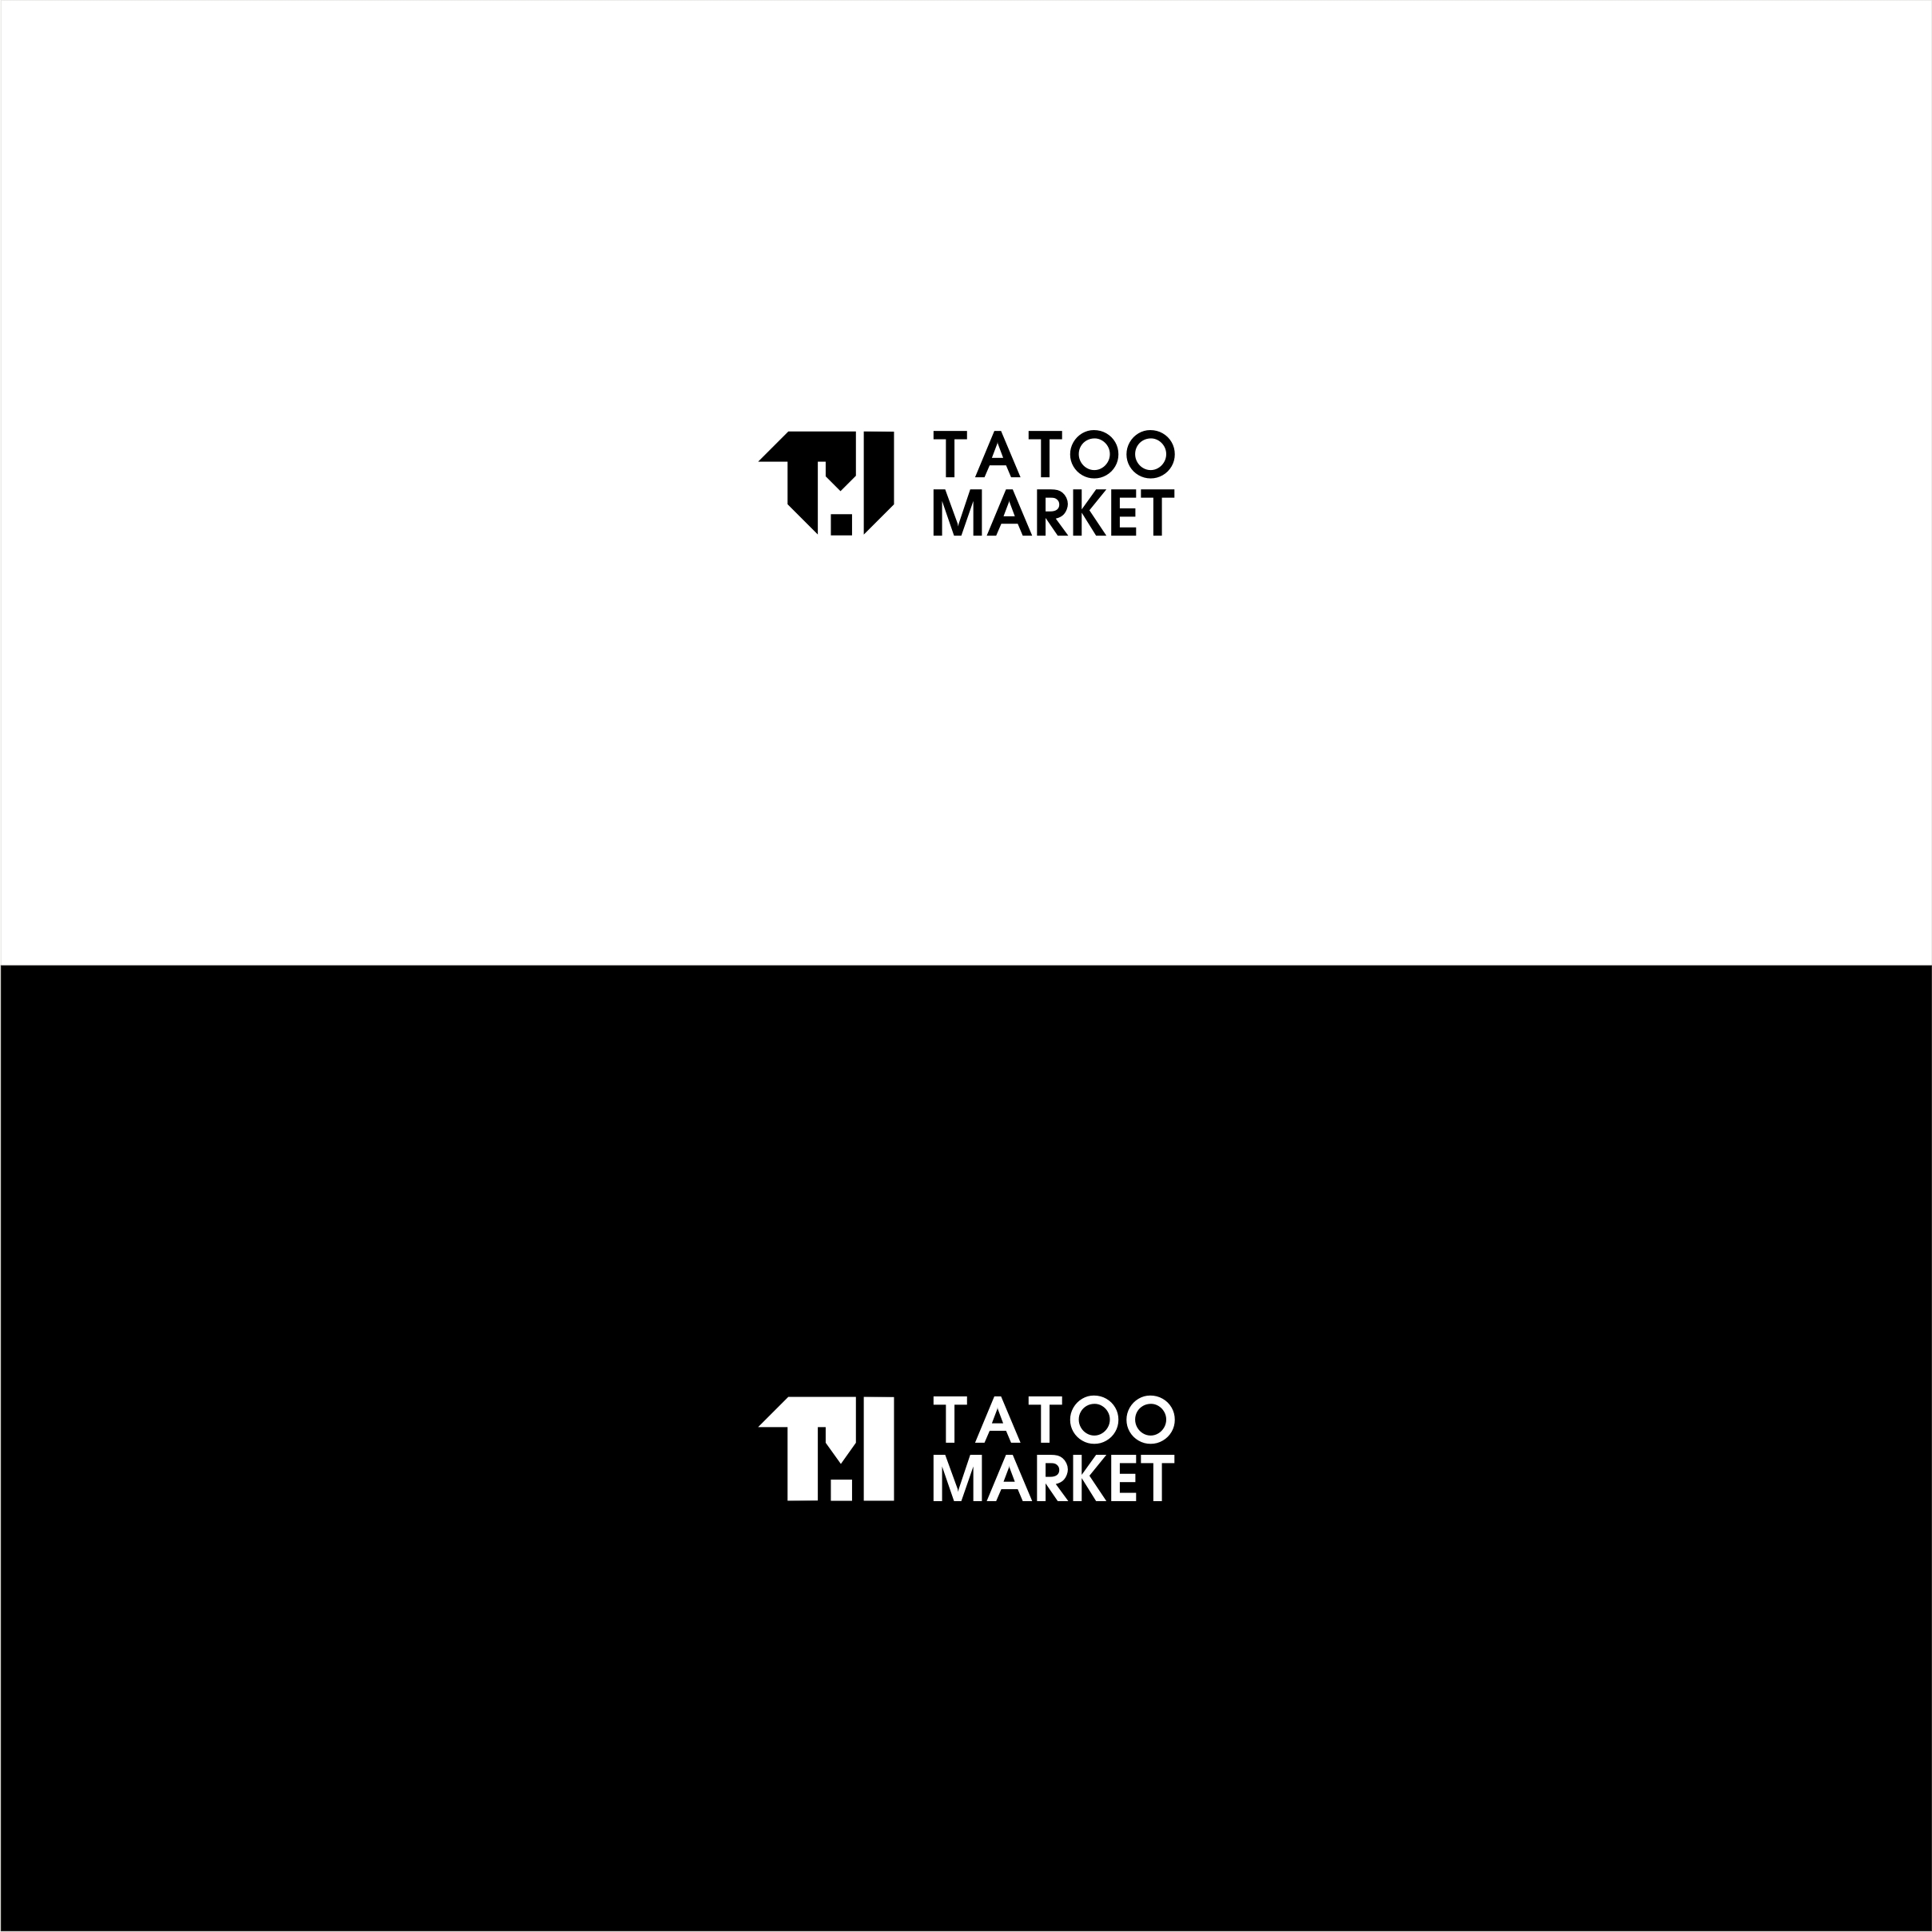 Редизайн логотипа магазина тату оборудования TattooMarket.ru фото f_3595c4071542fe2b.jpg